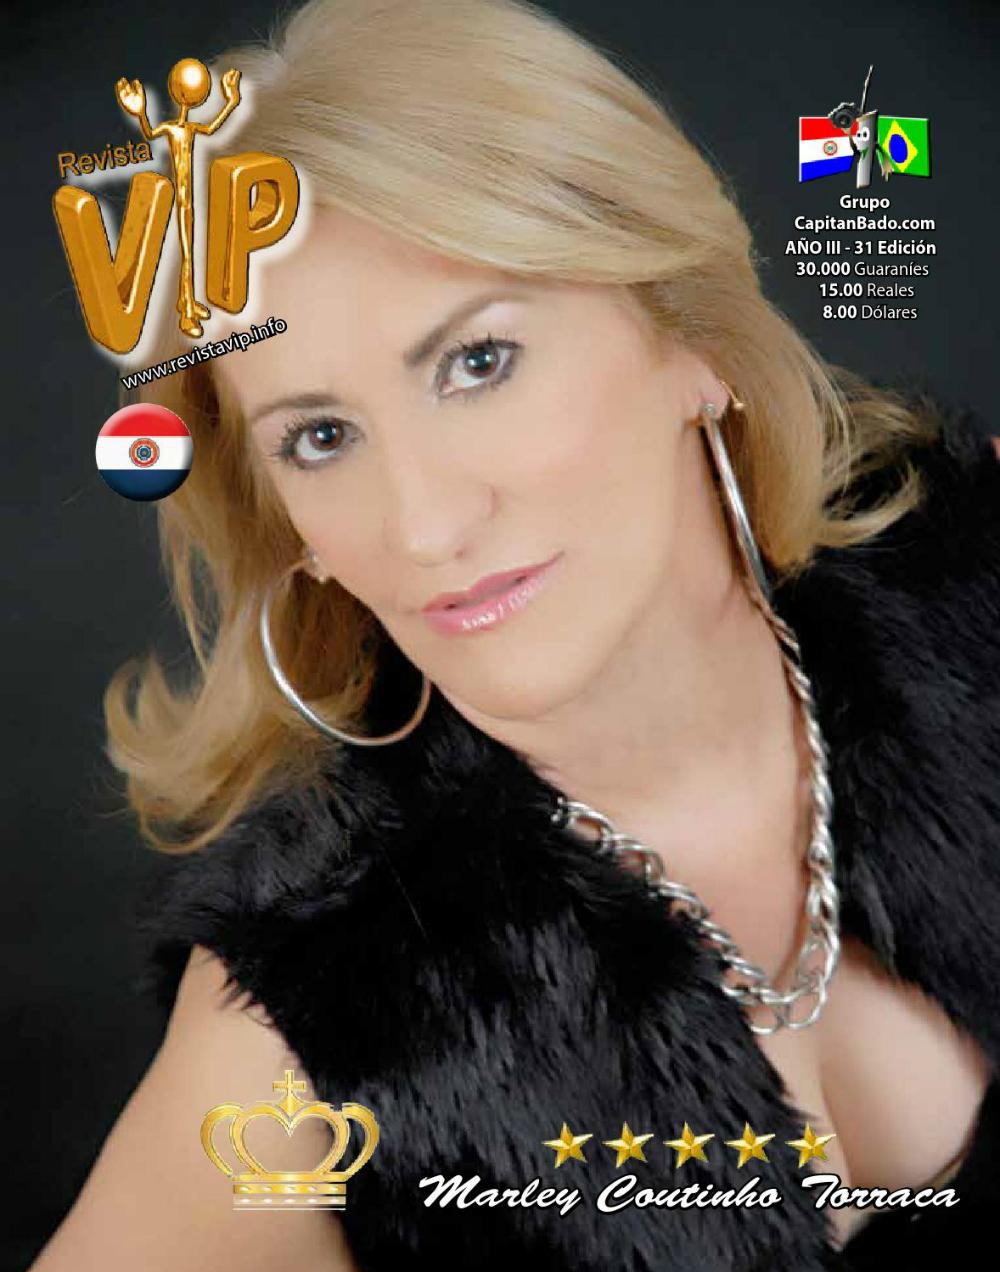 Vip 31 Paraguay